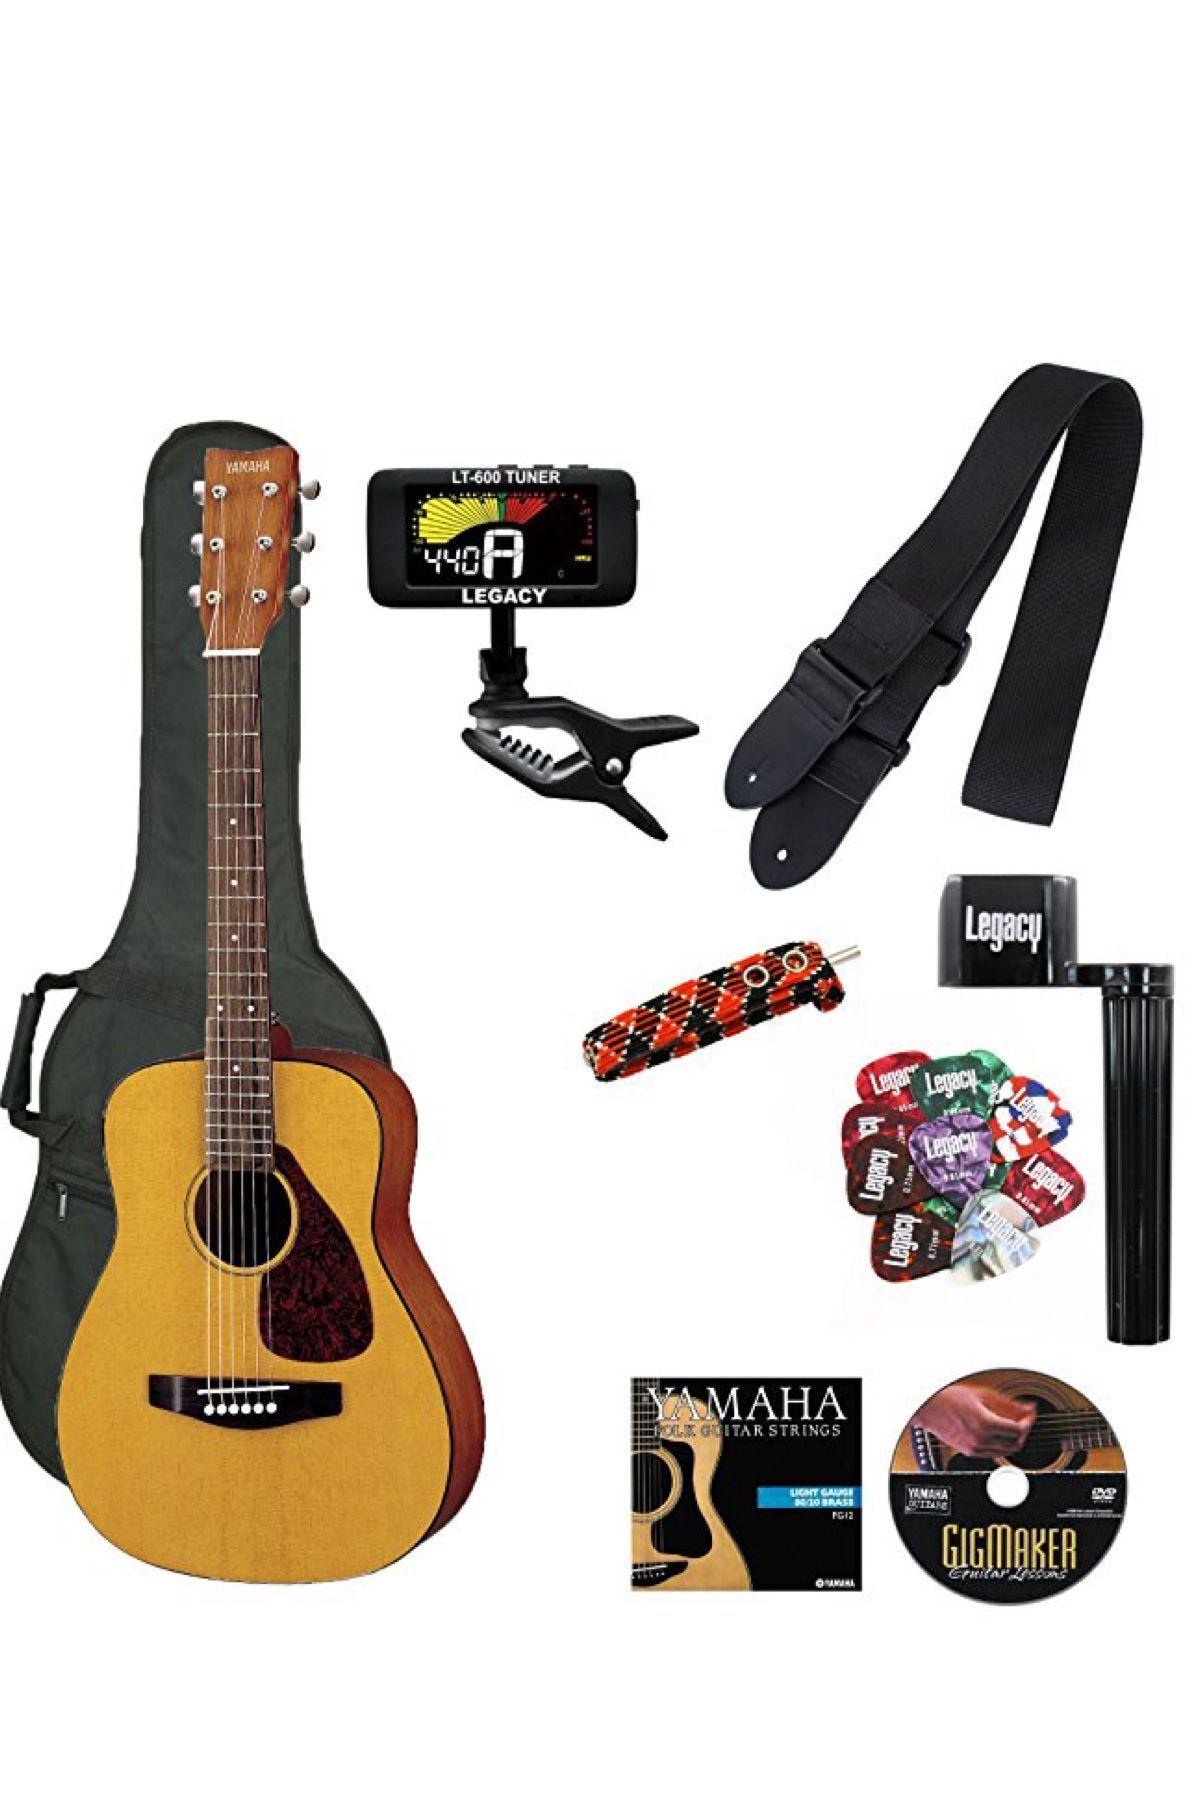 Yamaha Jr1 Fg Junior 3 4 Size Acoustic Guitar With Gig Bag And Legacy Accessory Bundle Guitar Acoustic Guitar Accessories Kids Acoustic Guitar Yamaha Guitar